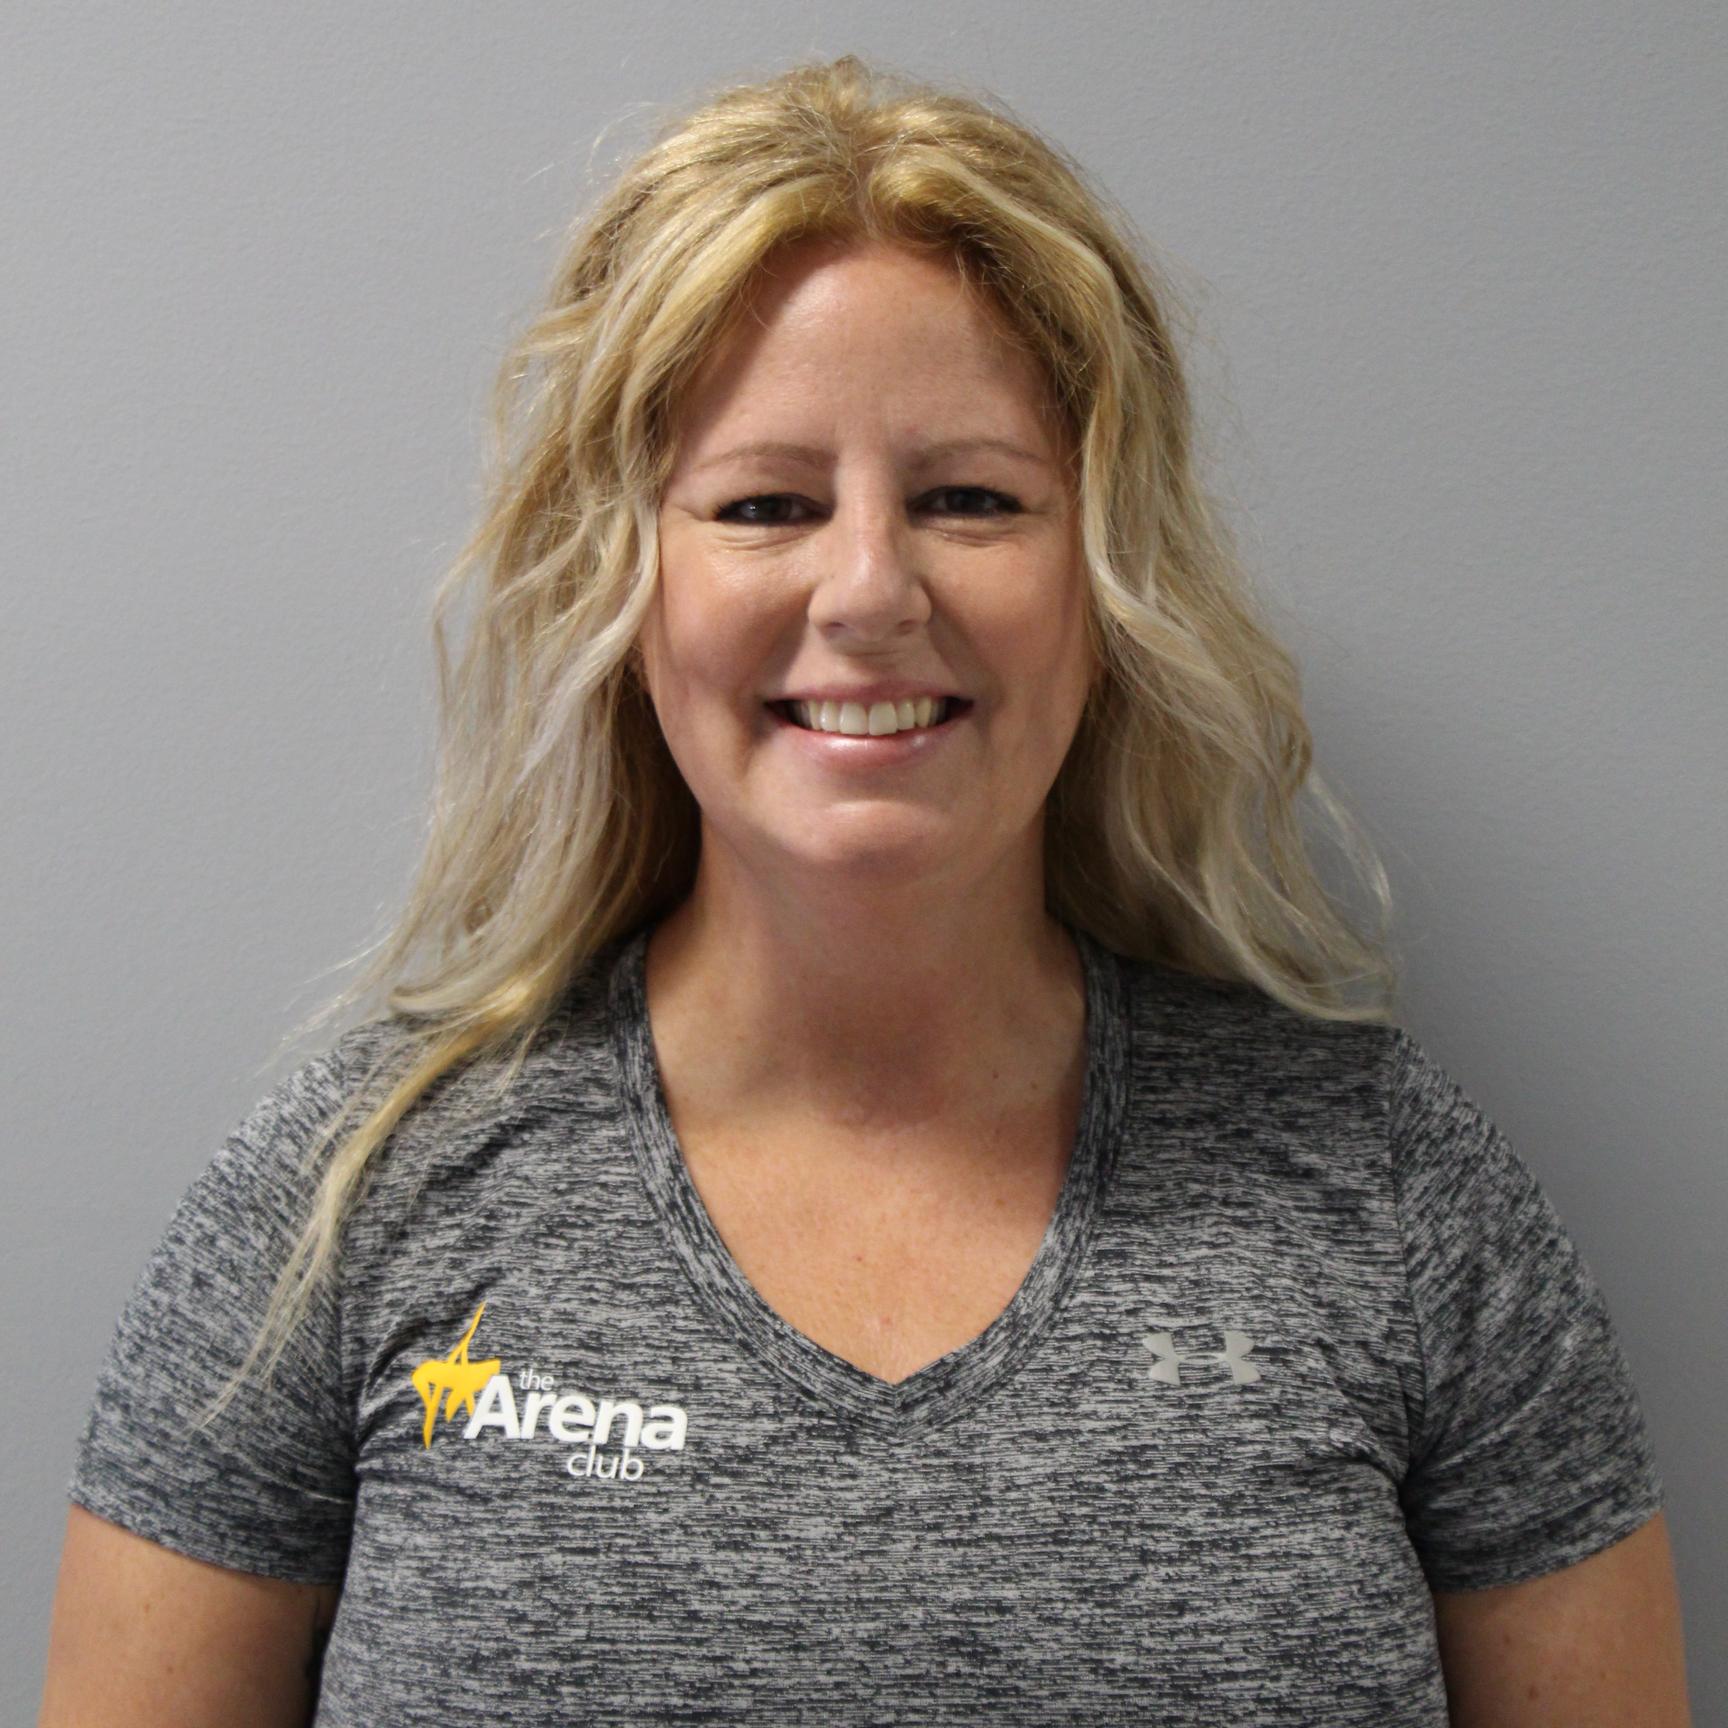 Nikki Fothergill - Certified Personal Trainer